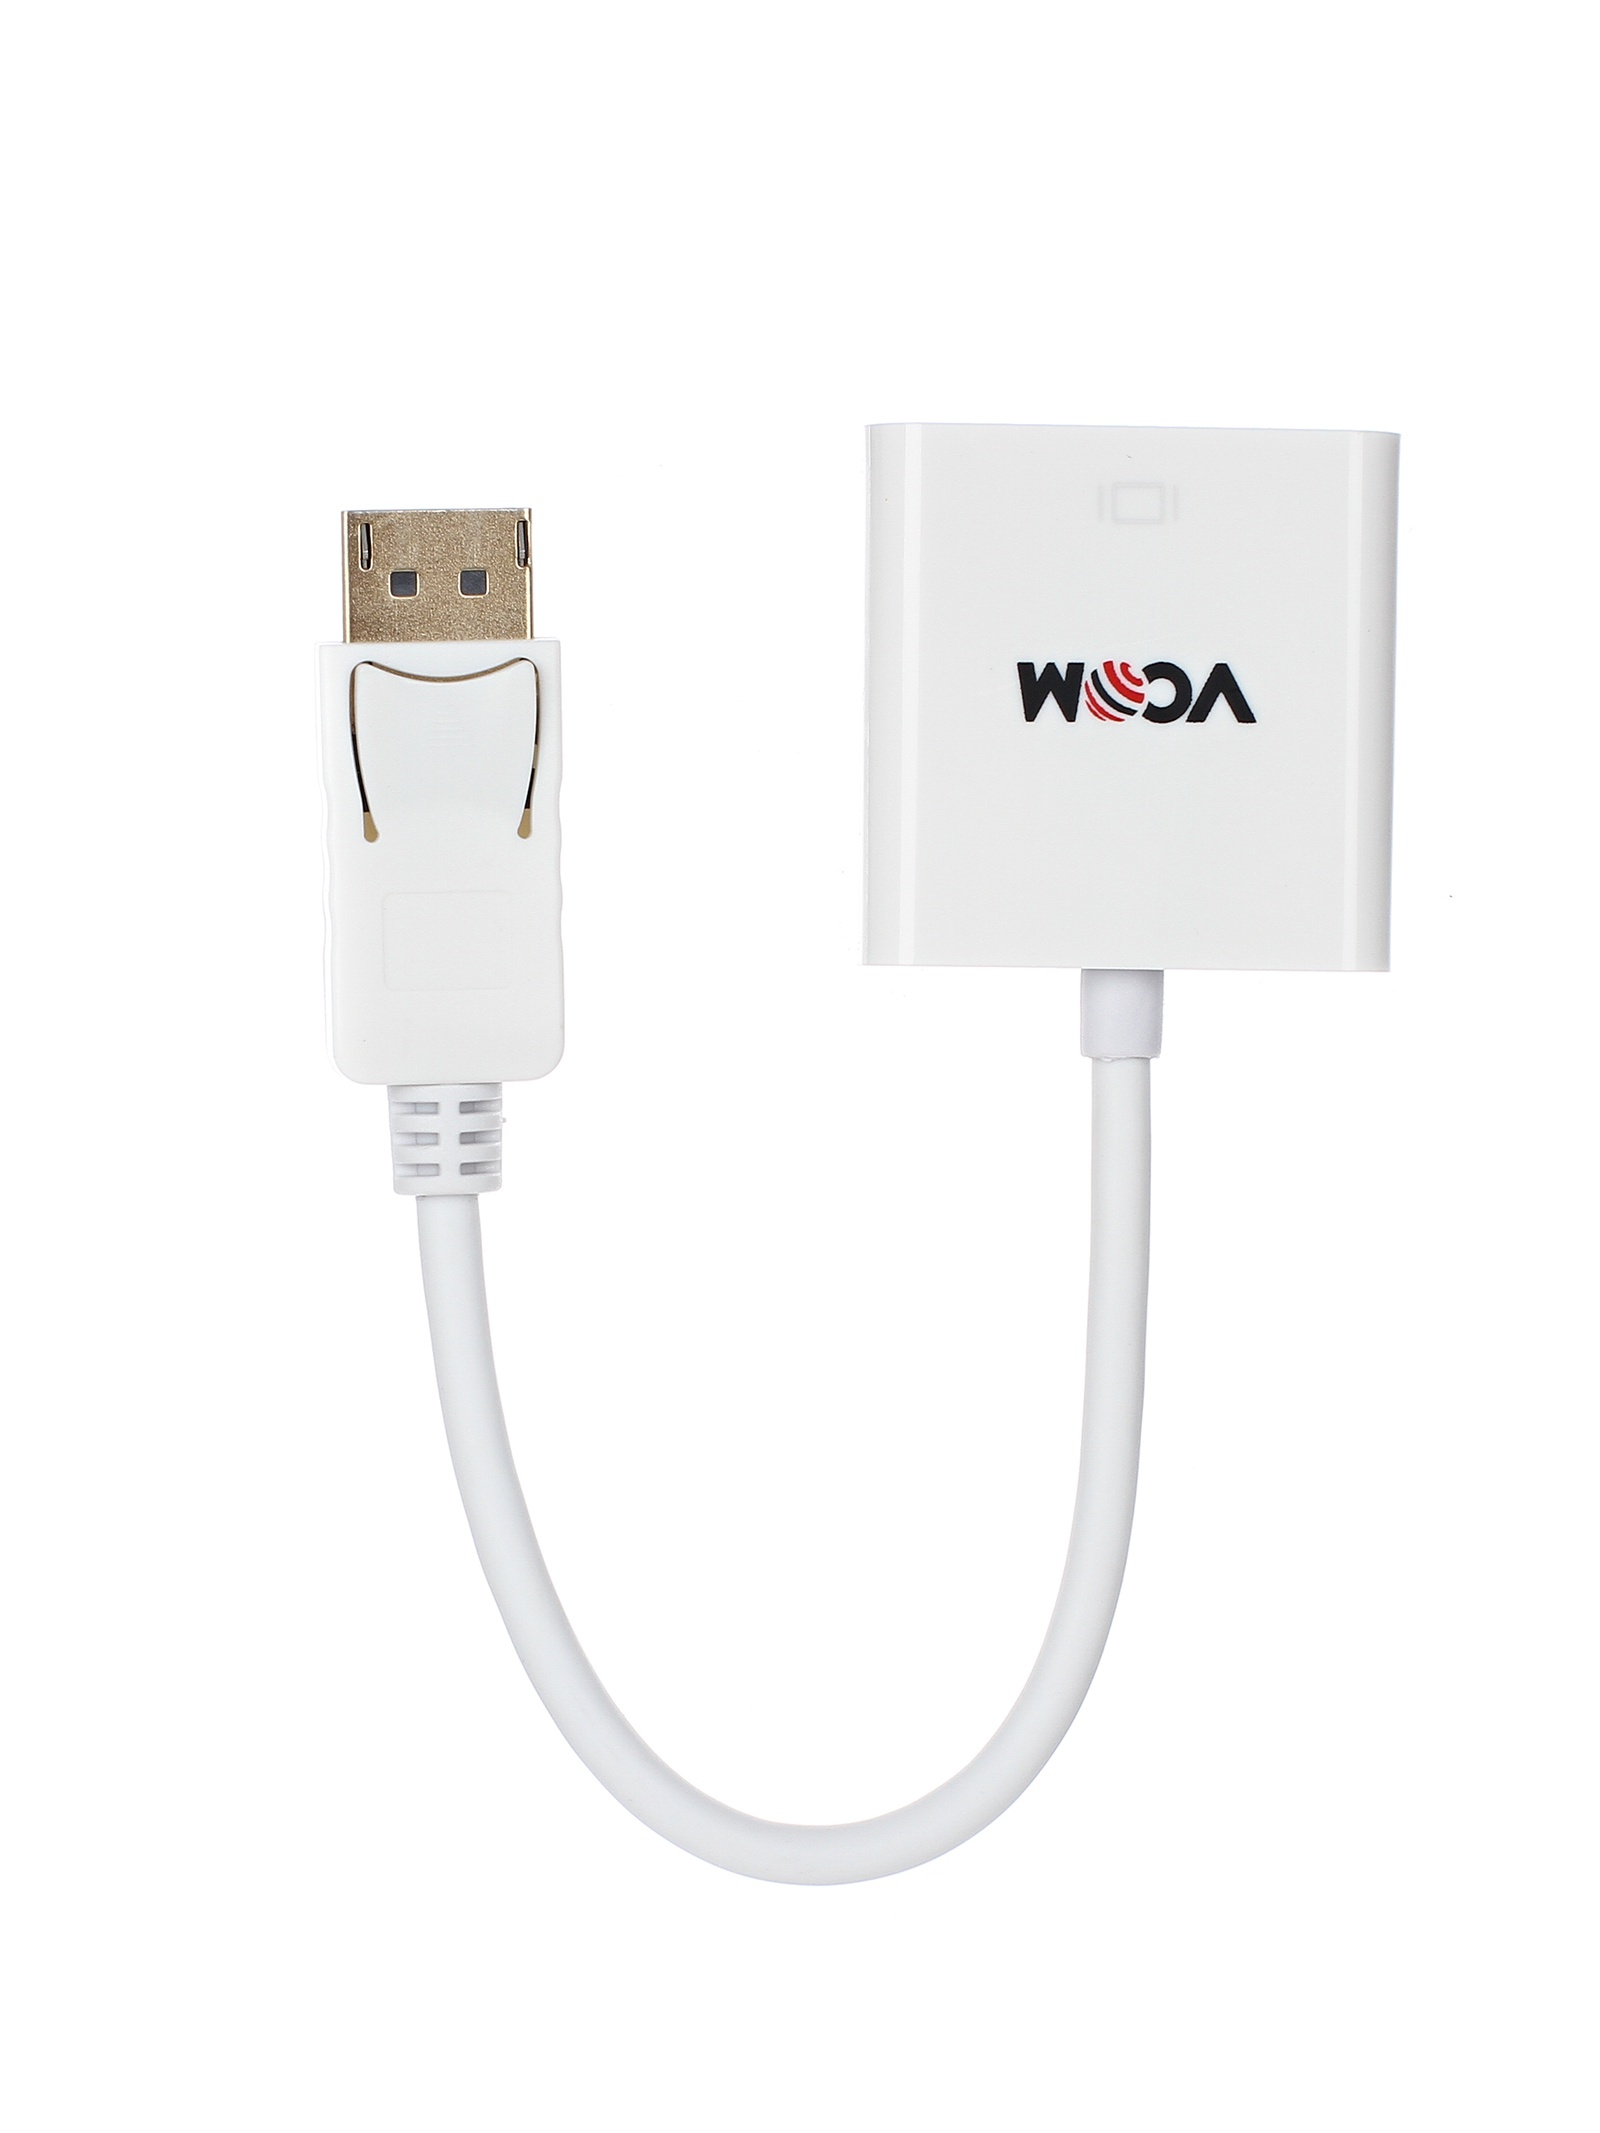 Кабель-переходник DisplayPort (M) to HDMI (F) 0.1m VCOM (CG553) аксессуар переходник питания vcom 1big to 2xsata vpw7572